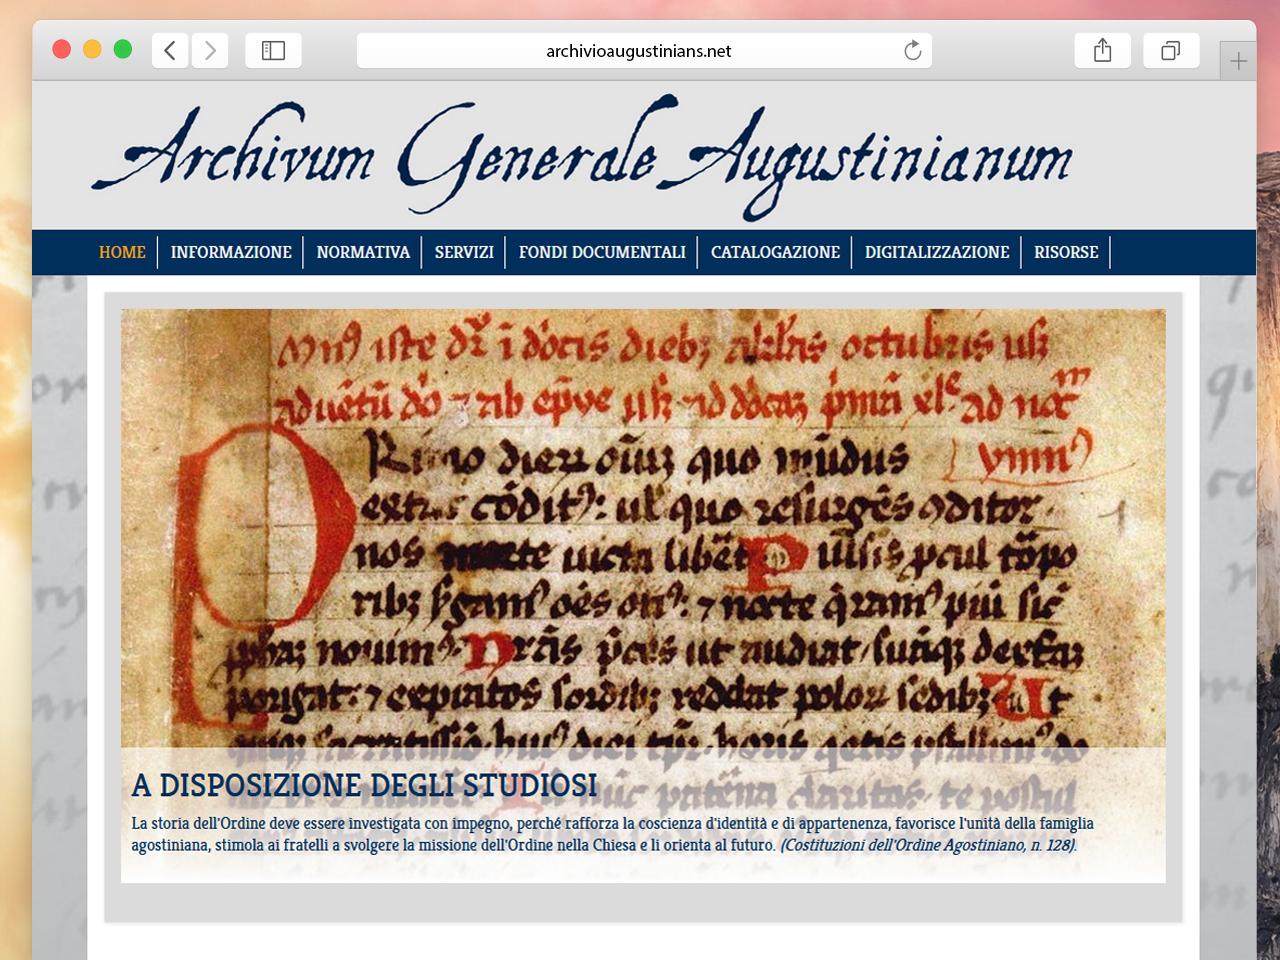 Archivum Generale Augustinianum – Marco Prosperi